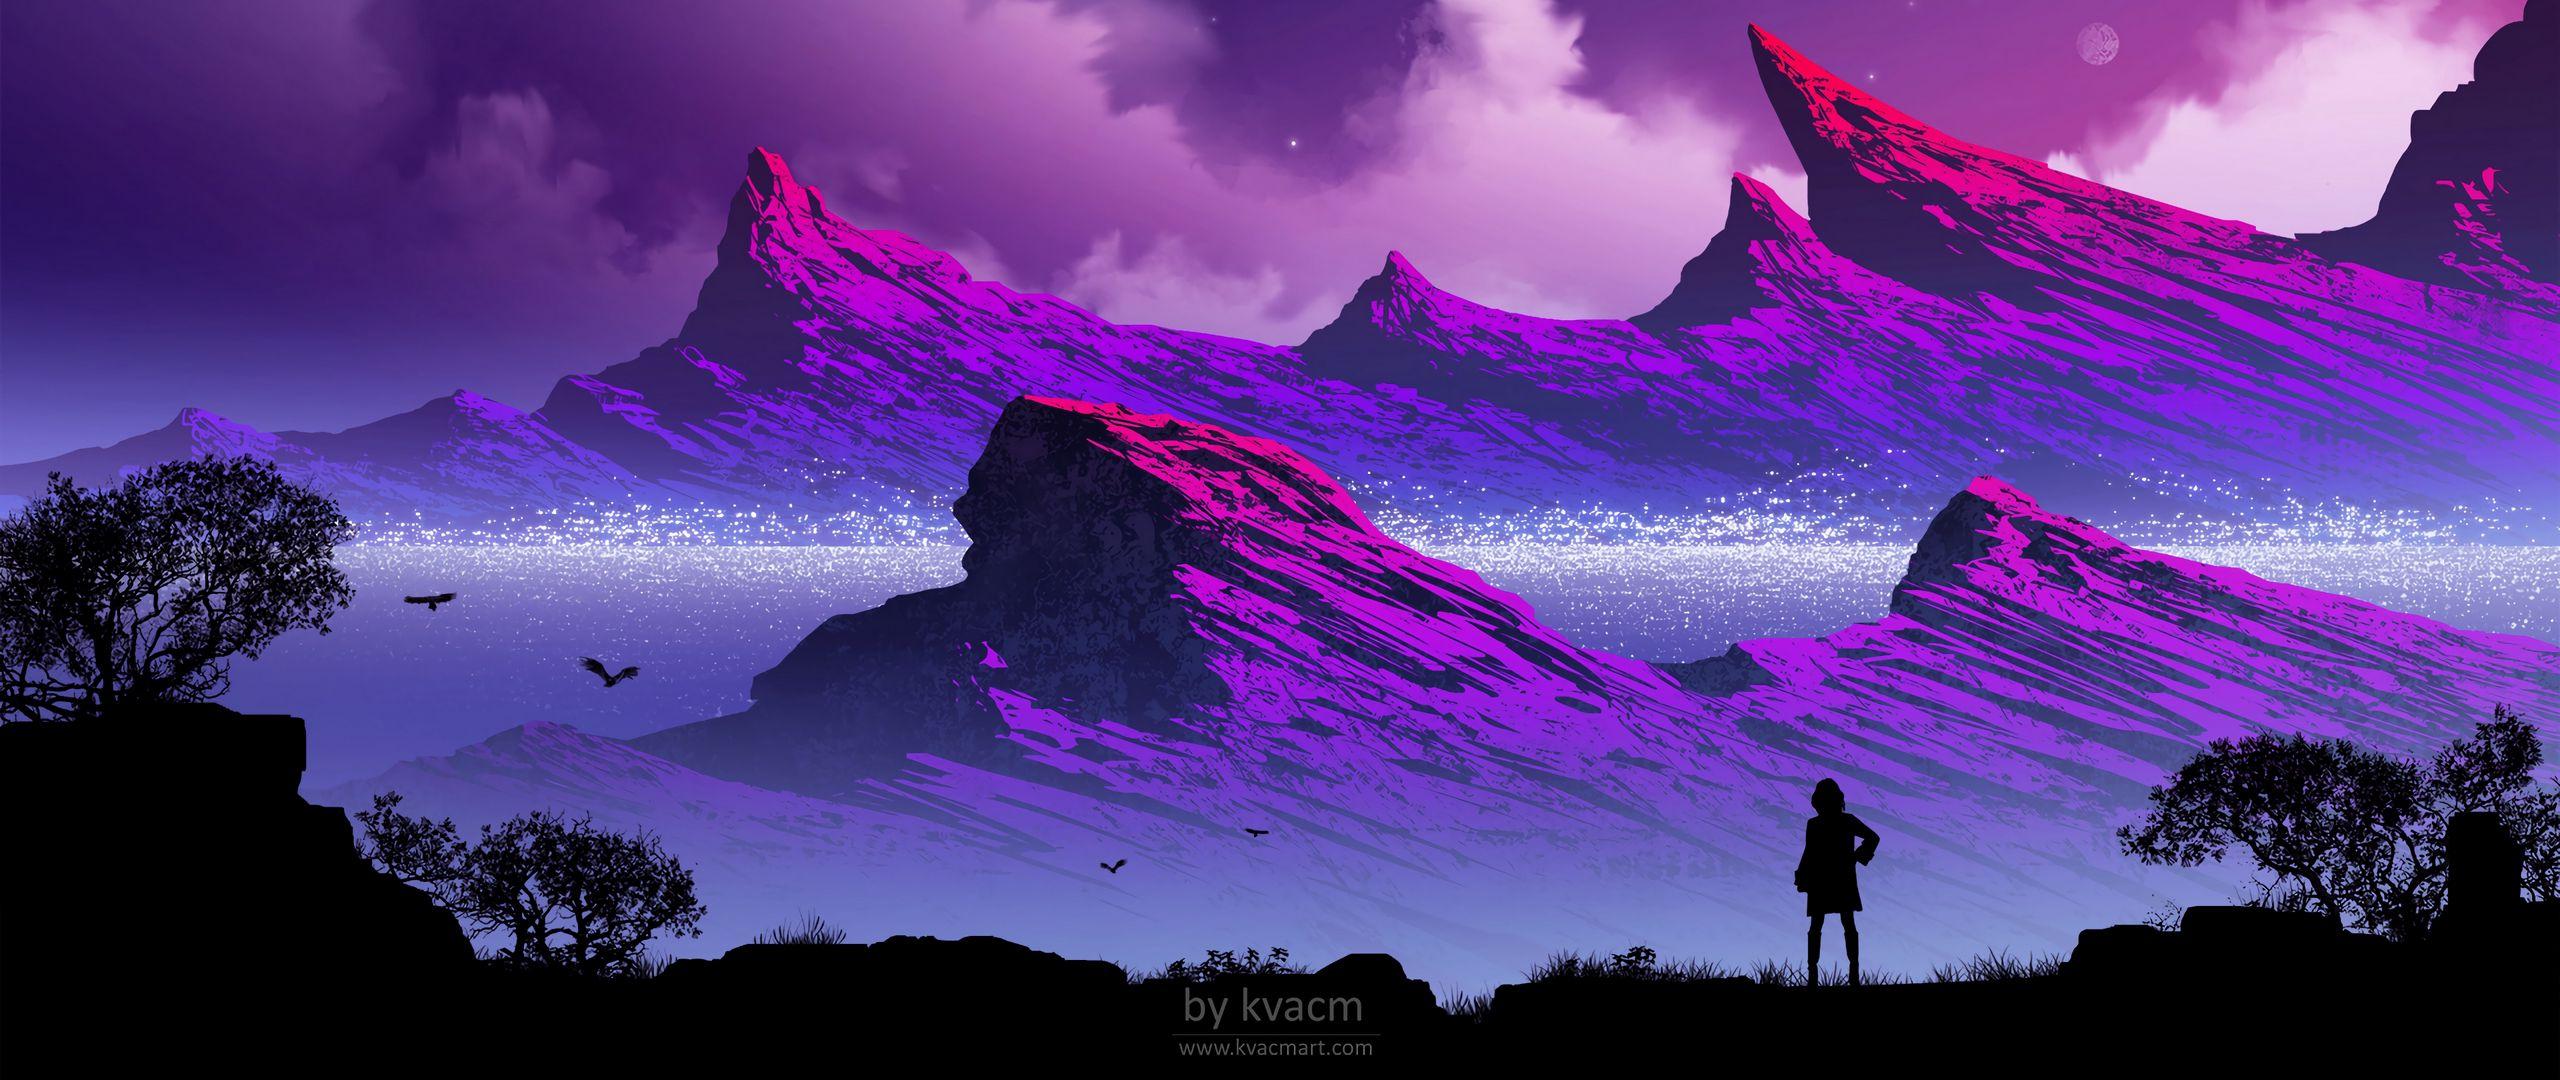 Wallpaper Silhouette Mountains Clouds Art Fog Minimalist Hd Iphone 2560x1080 Download Hd Wallpaper Wallpapertip